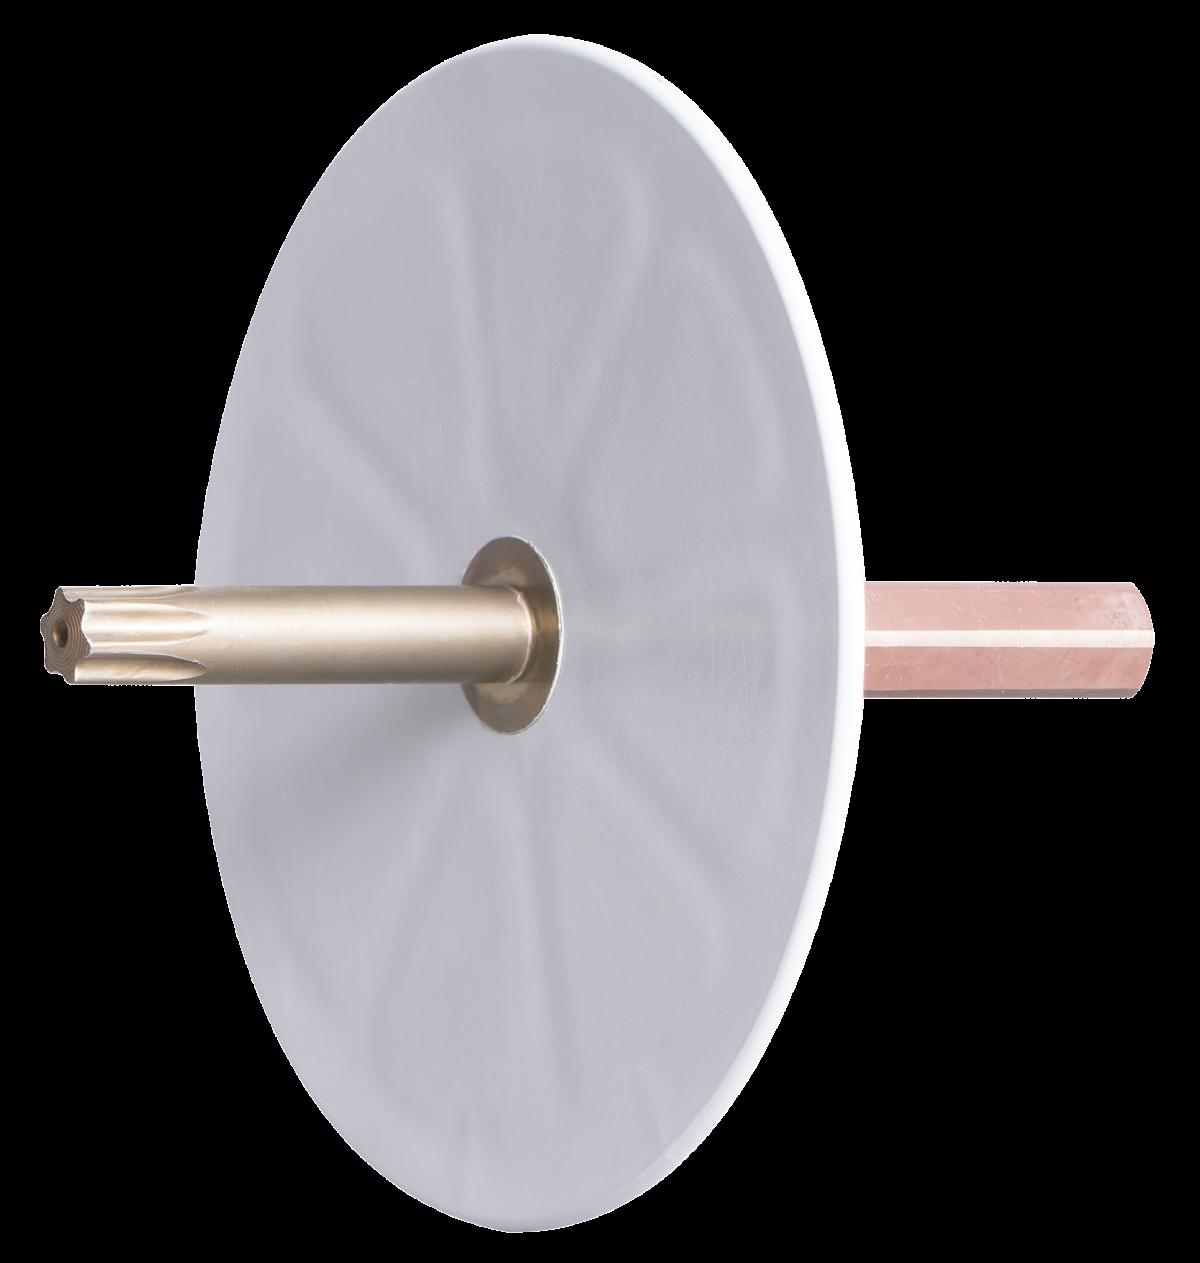 R-TFIX-TOOL-GREY Setting tool